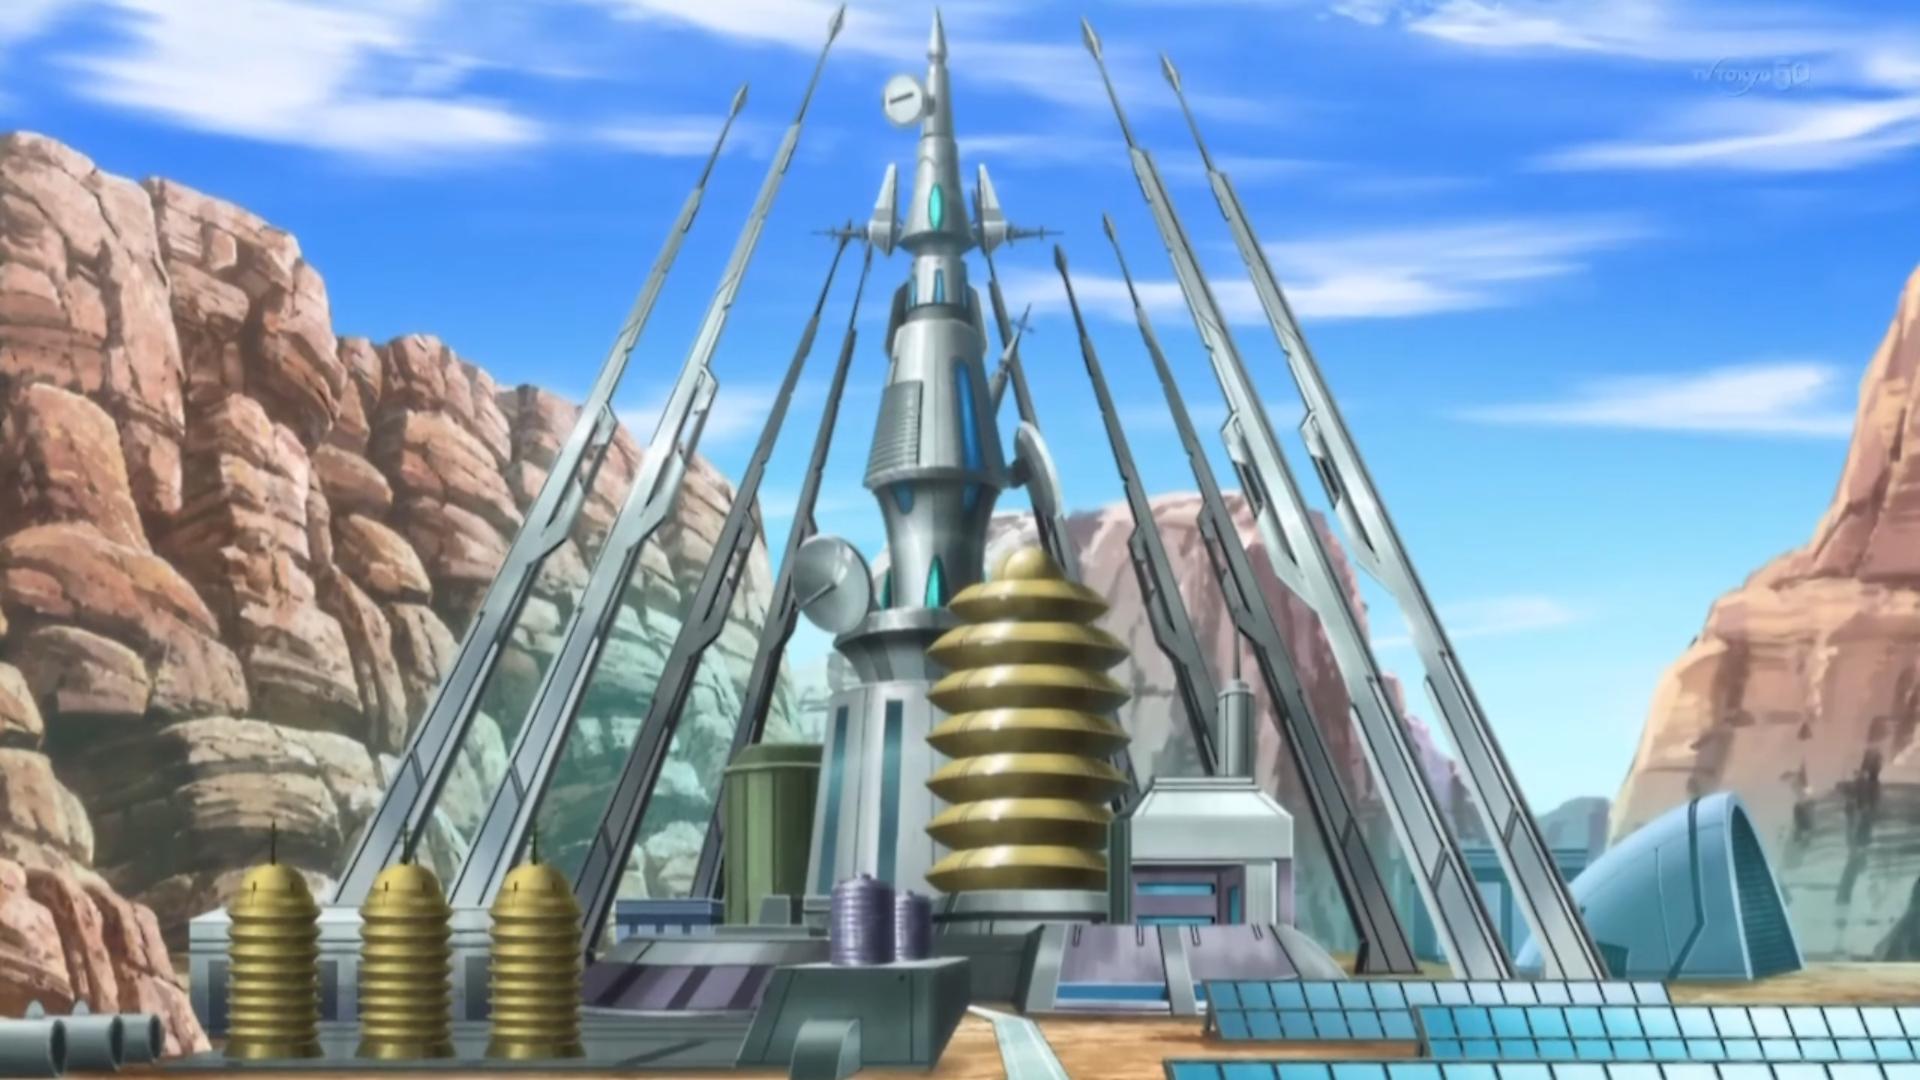 pokemon x electrical plant image - kalos power plant anime.png   pokémon wiki ...